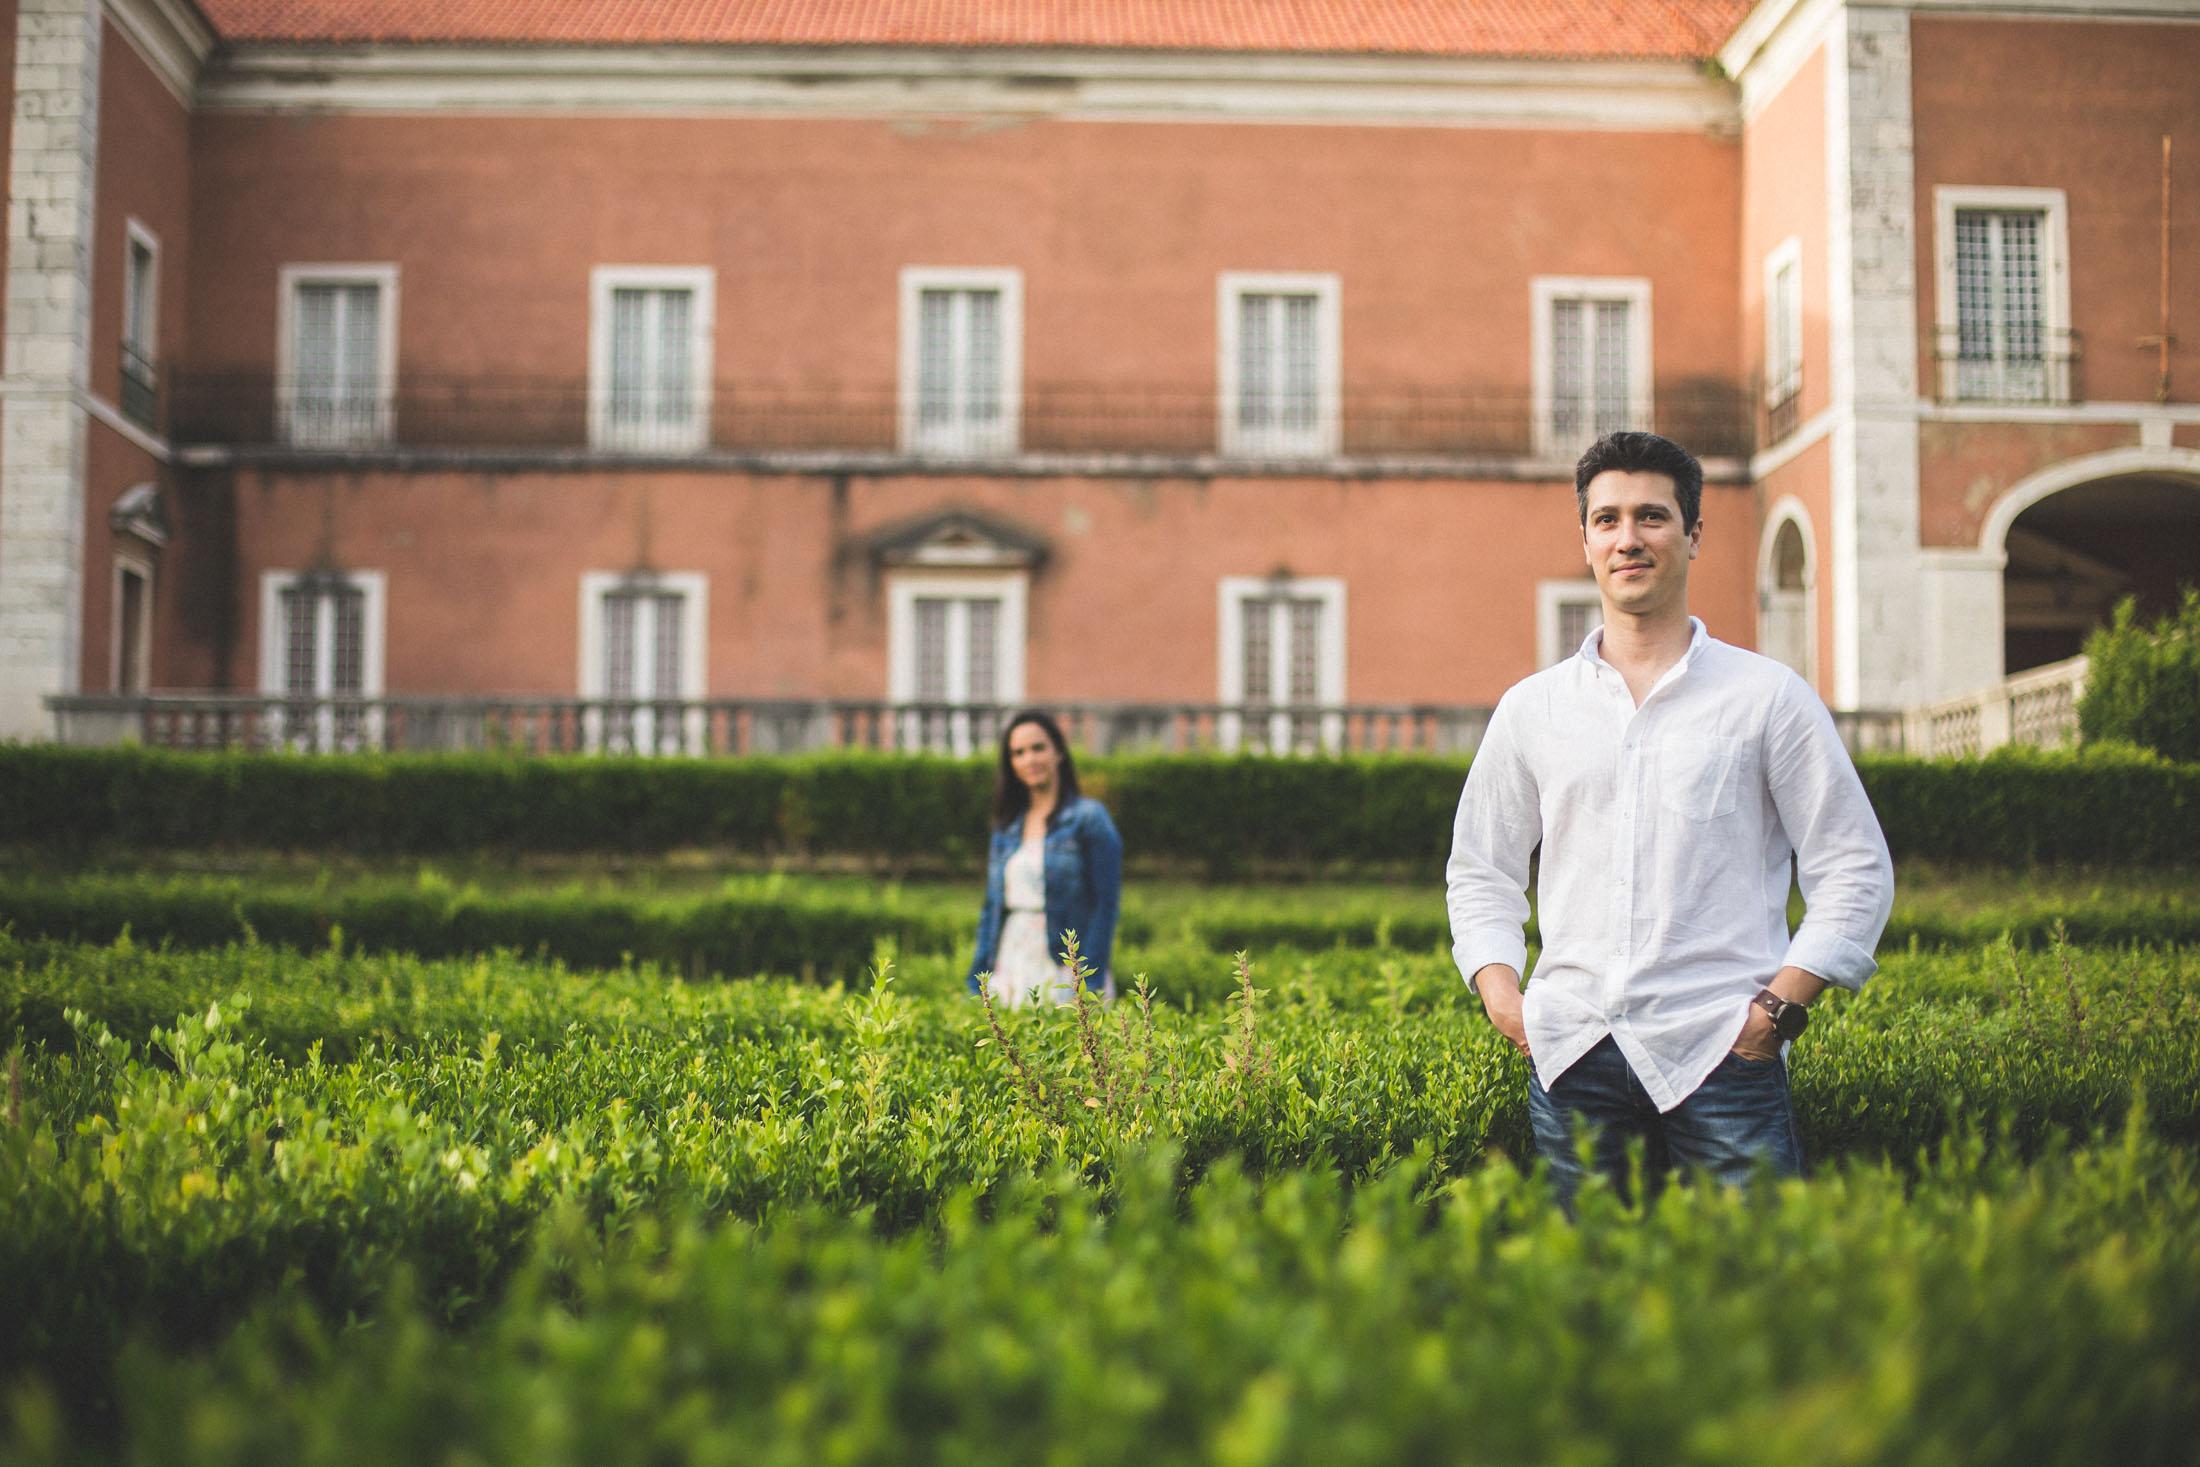 13 engagement-love-session-fundacao-Champalimaud-Filipe-Santiago-Fotografia-Lisboa-Mafra-Malveira-Fotografo